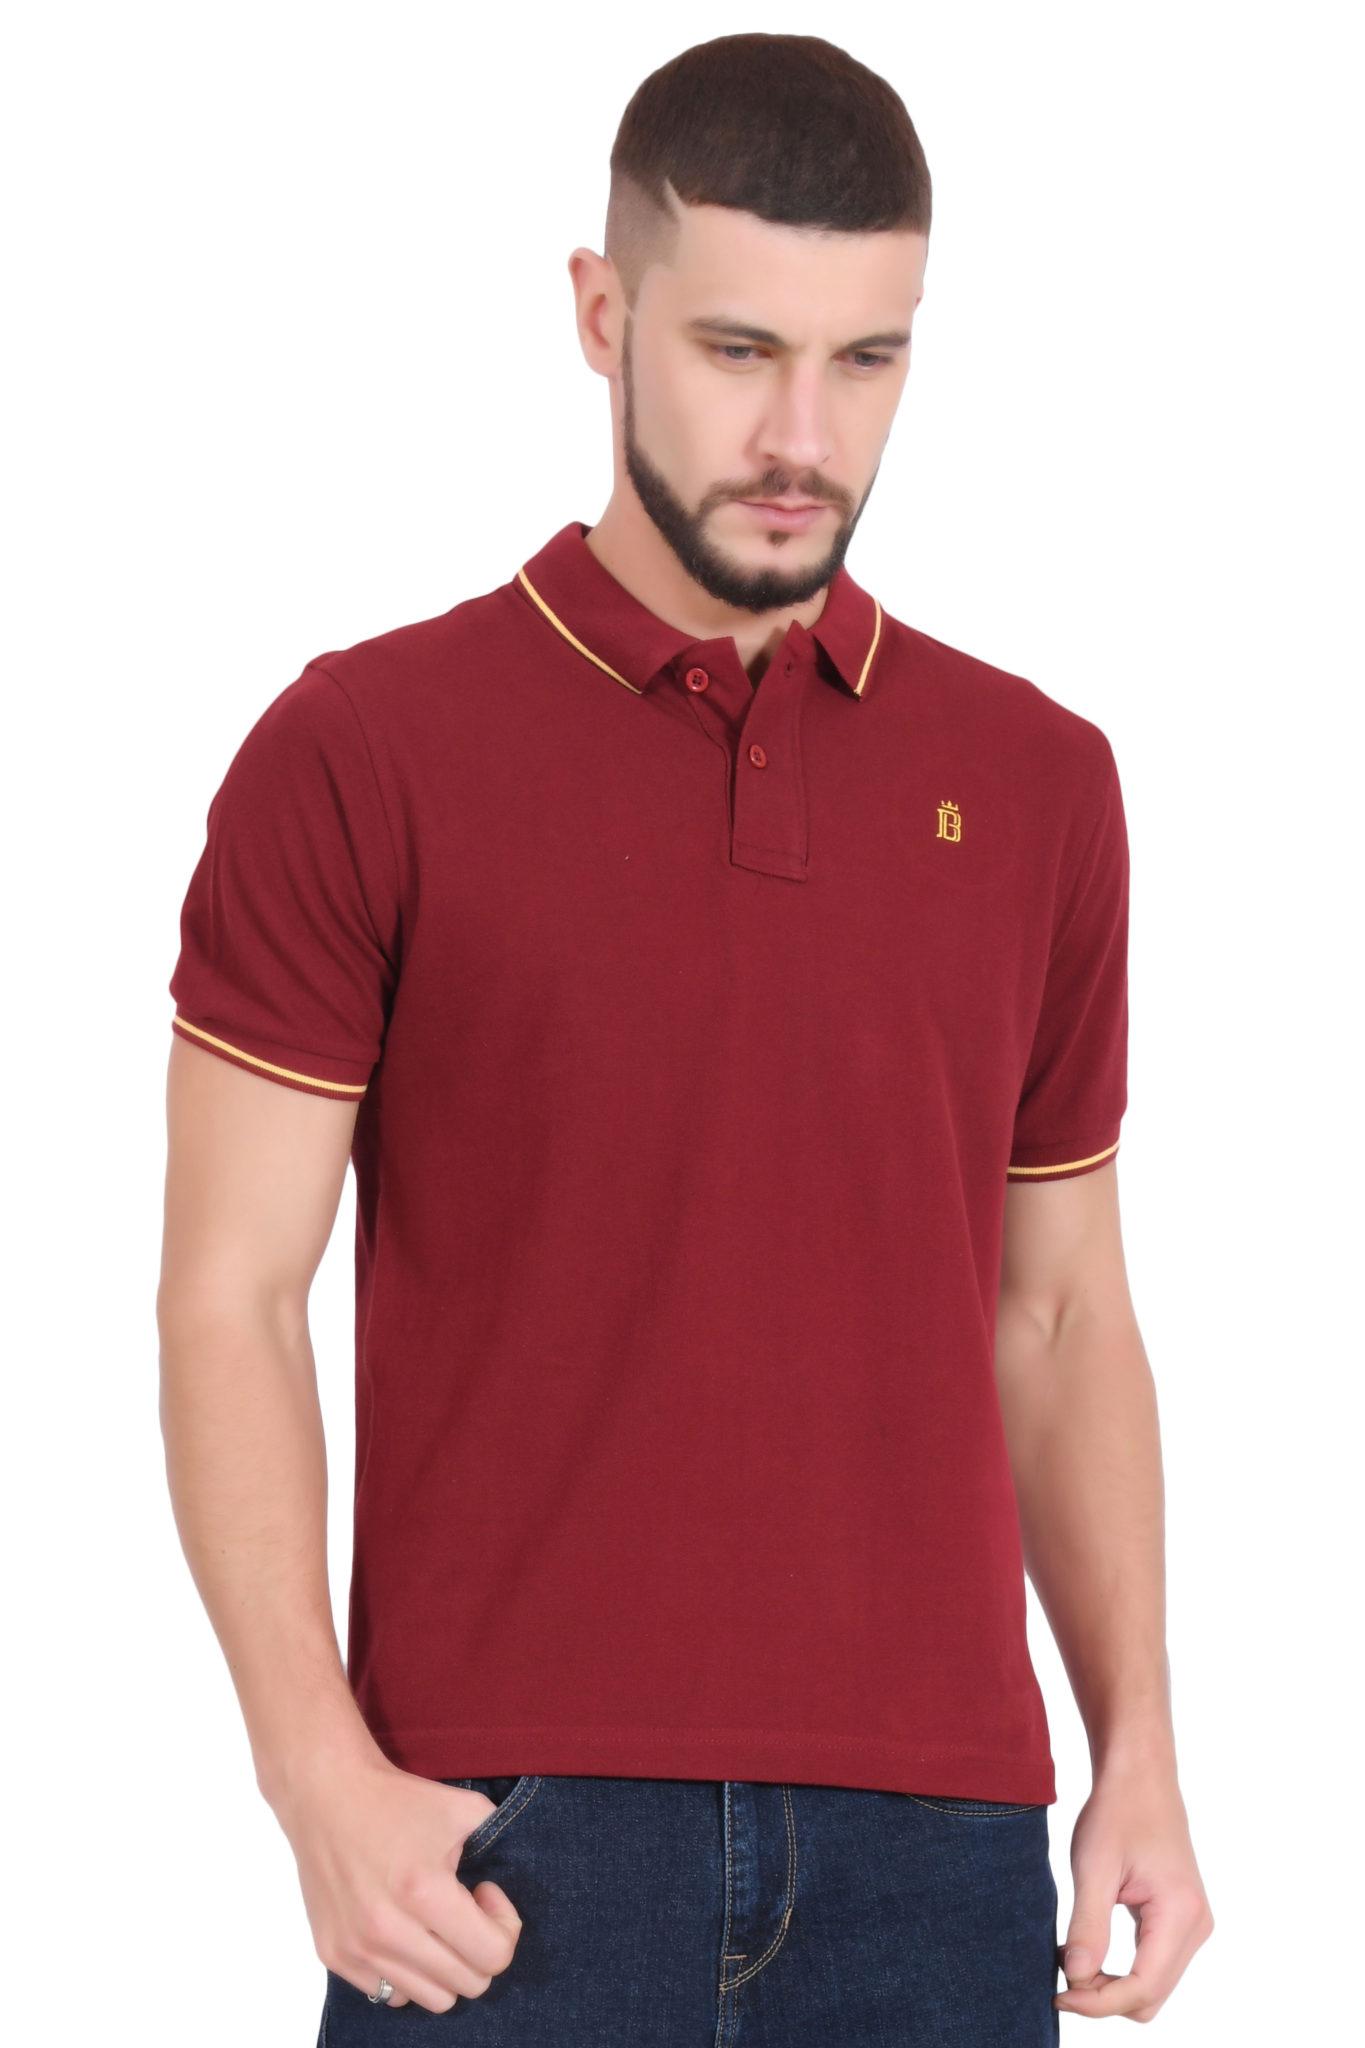 bd2cb3ed4 Plain Cotton Maroon Polo T shirt for Men - by BlueAura Apparels